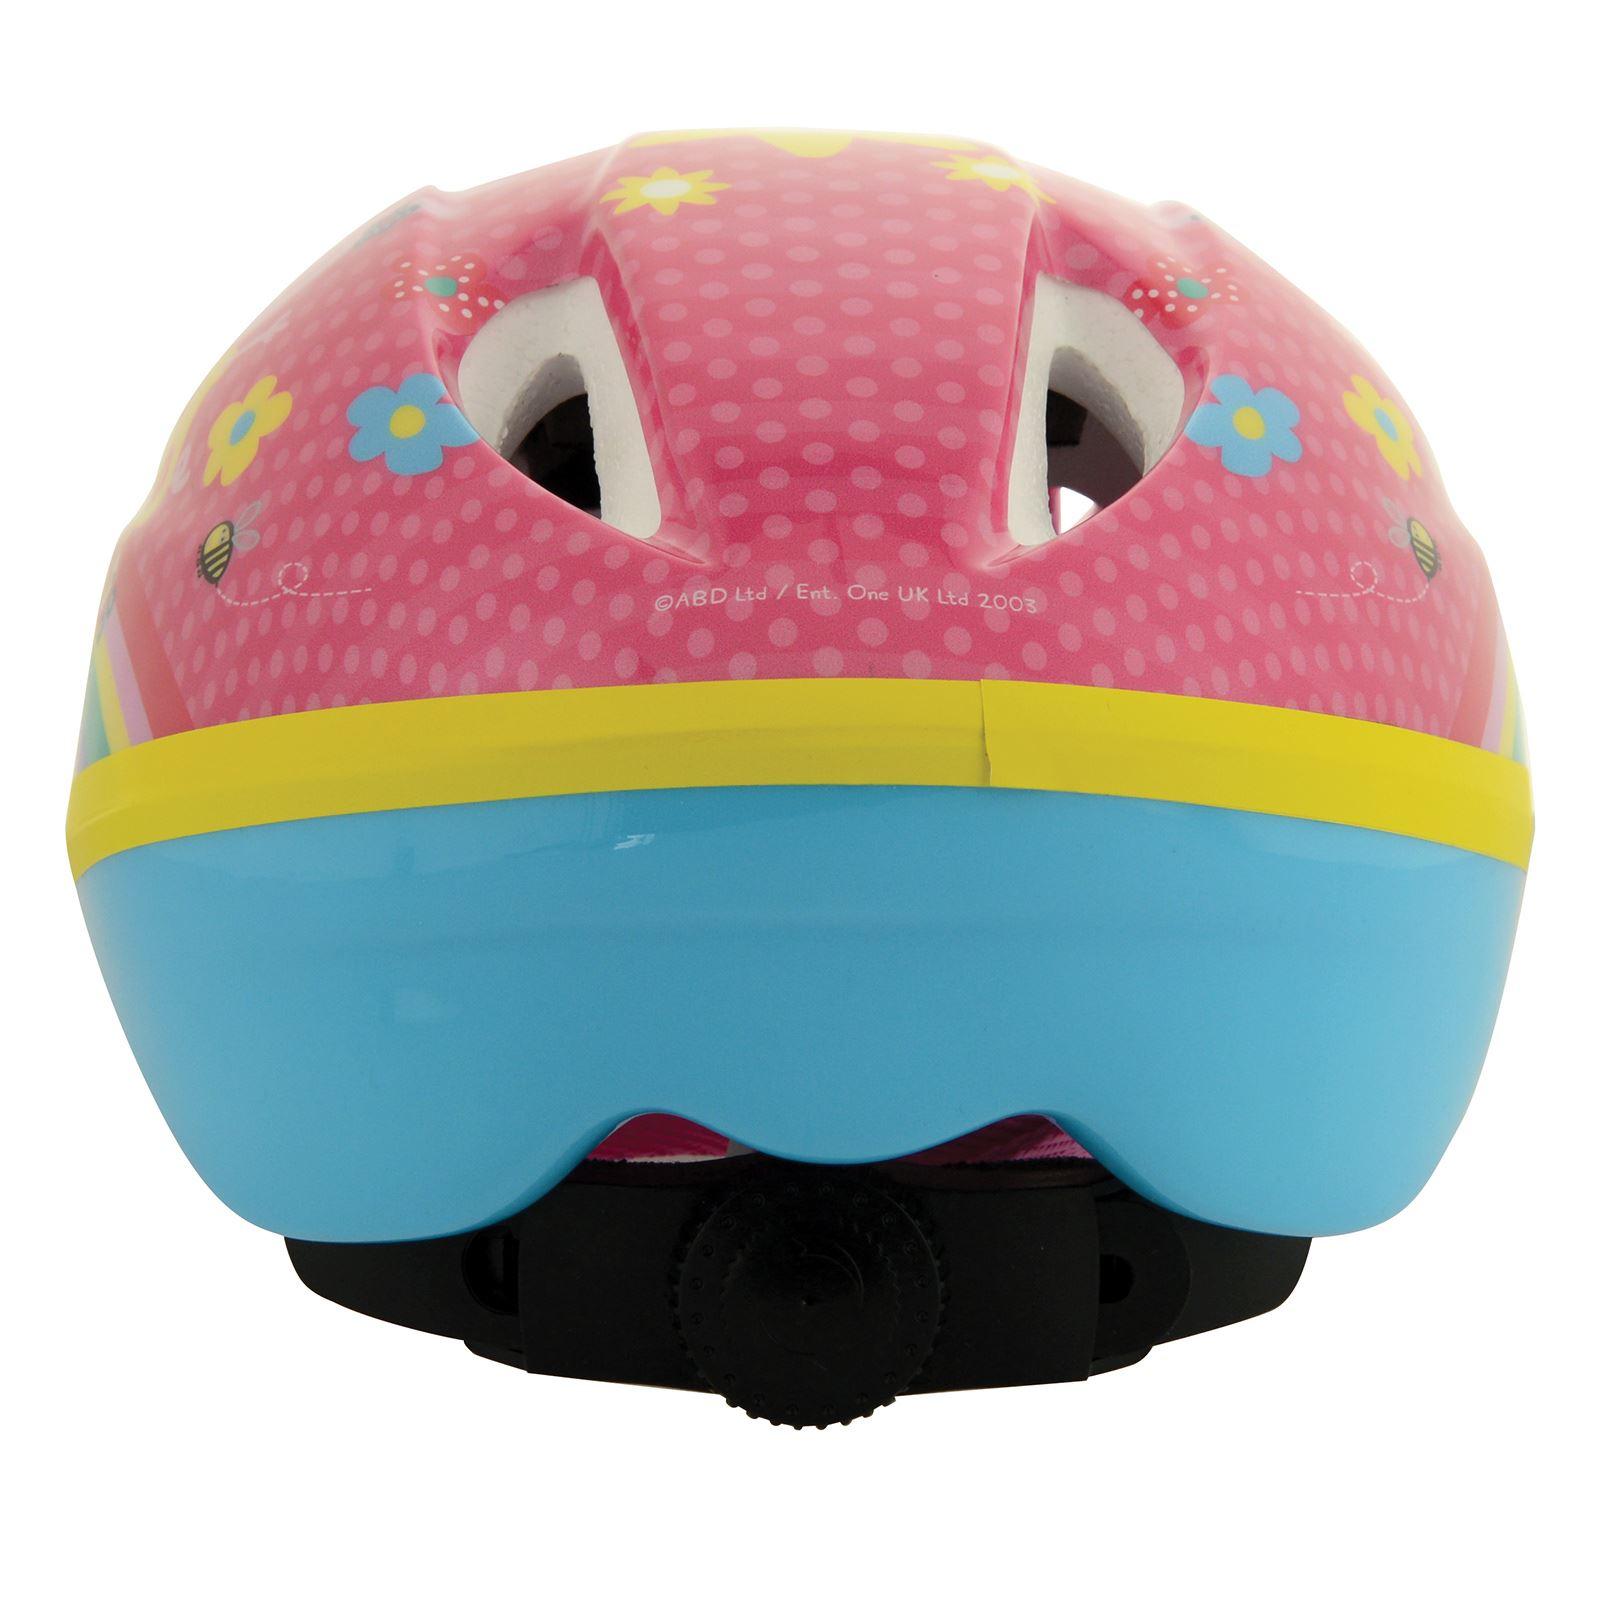 Fireman Sam 3d Wallpaper Childrens Disney Character Safety Cycle Bike Helmets